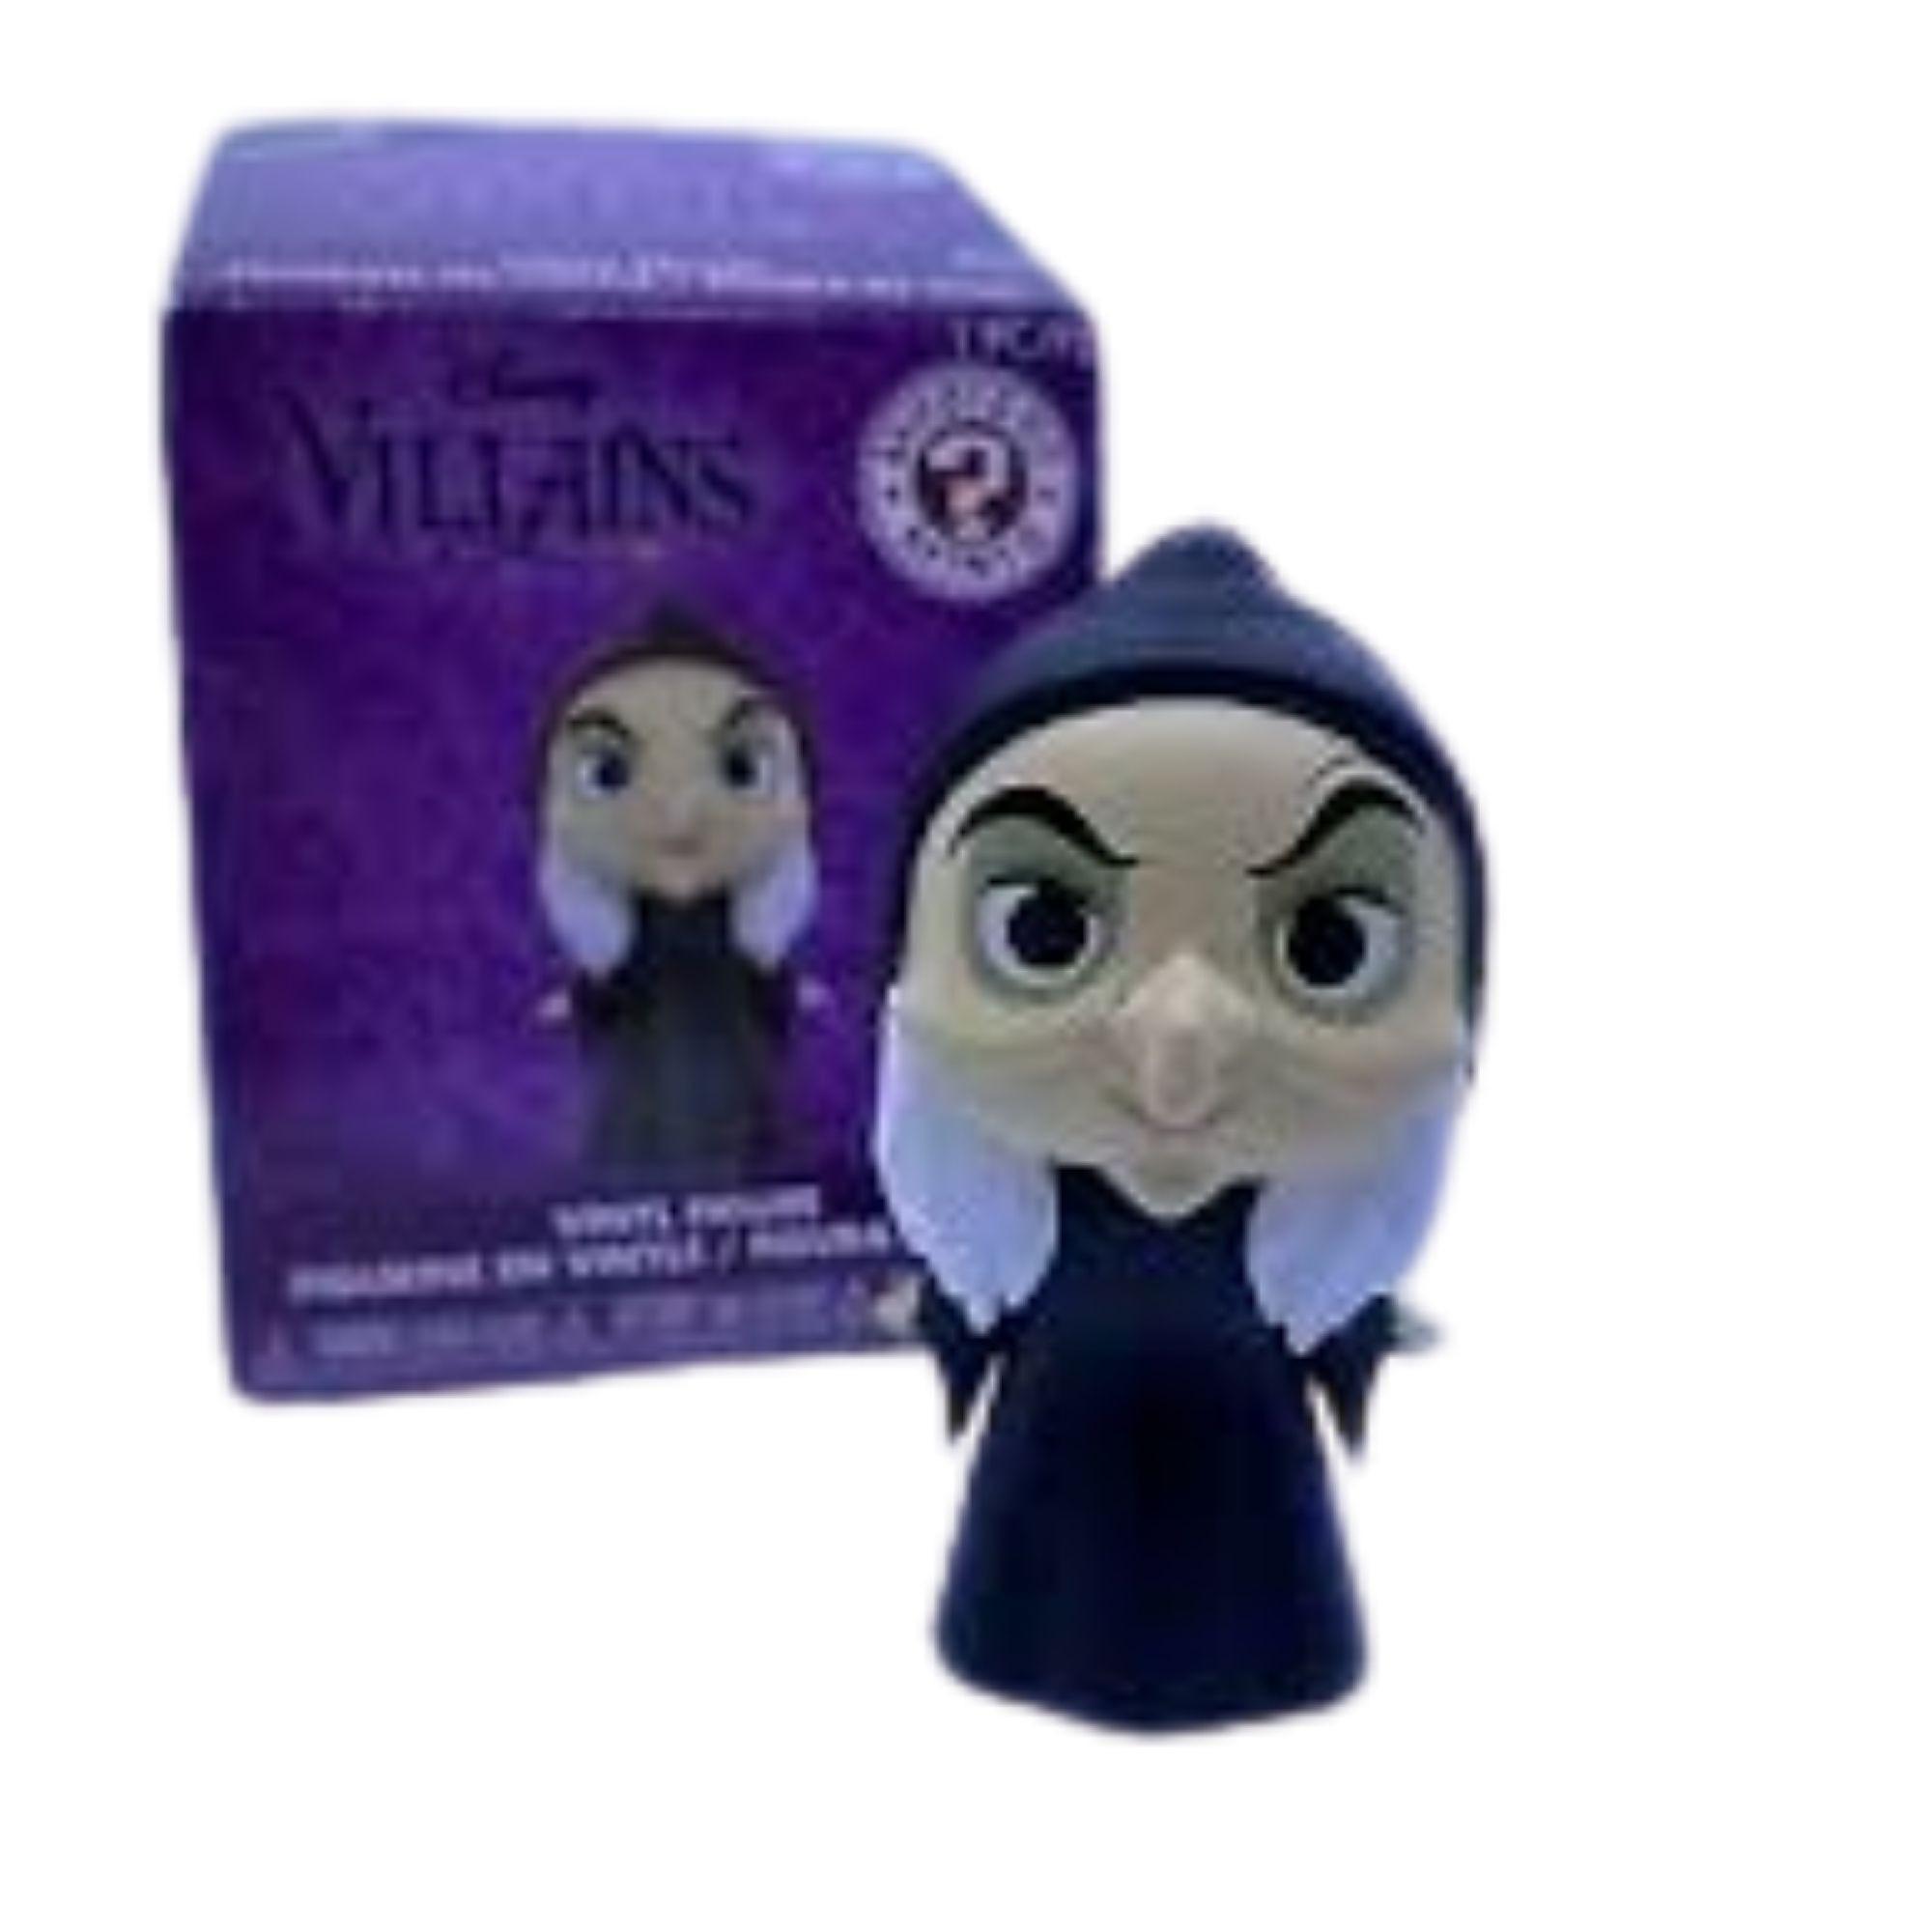 Funko Mini Mystery Disney Villains Bruxa da Branca de Neve  - Game Land Brinquedos